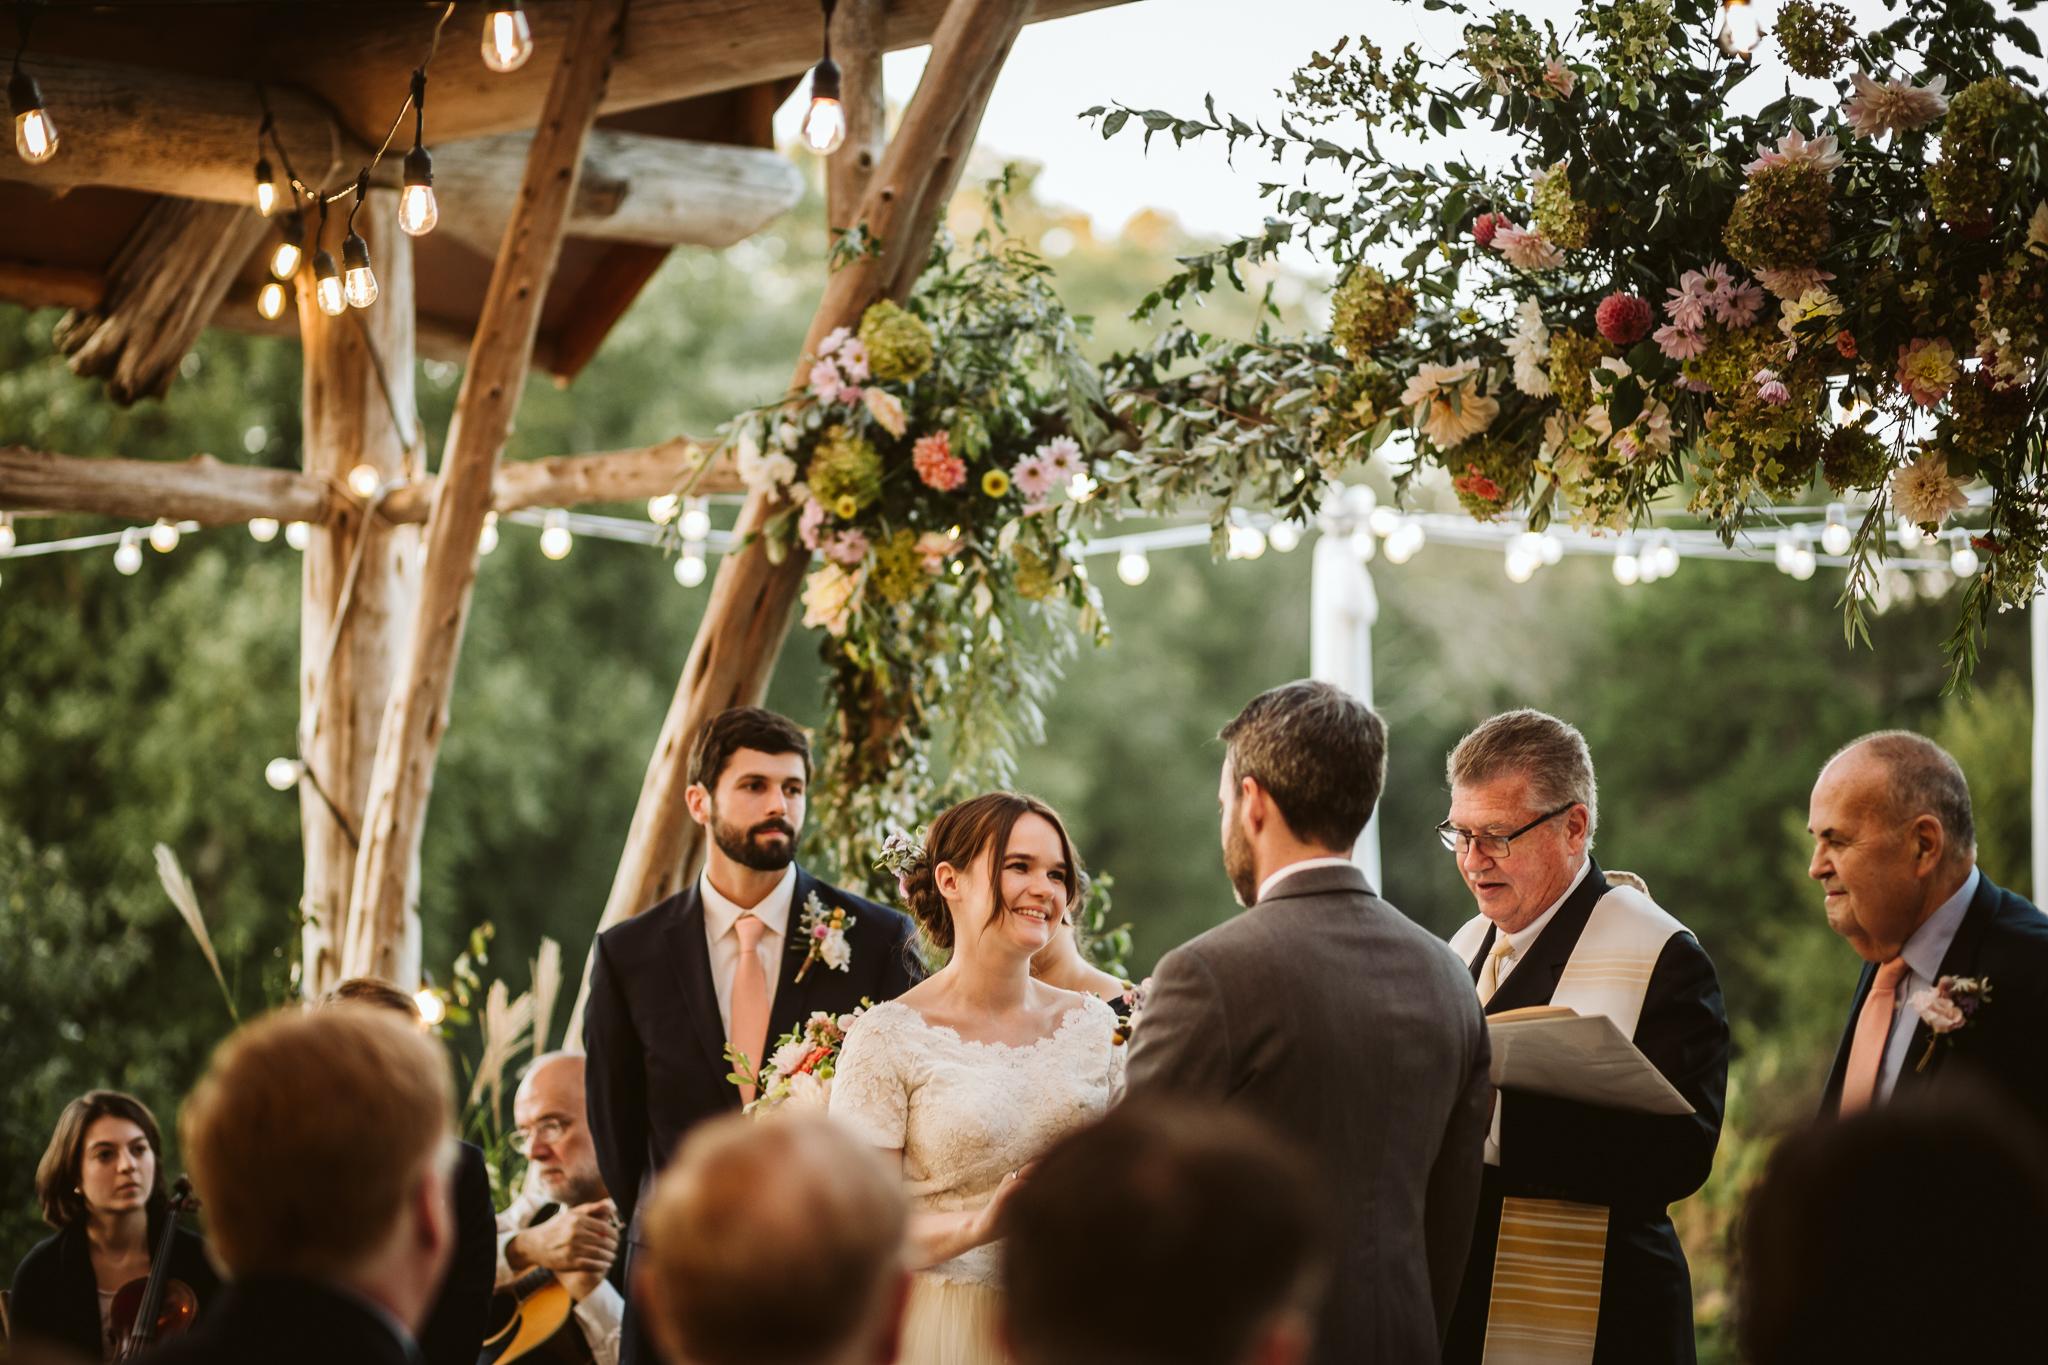 Wollam_gardens_wedding53.JPG